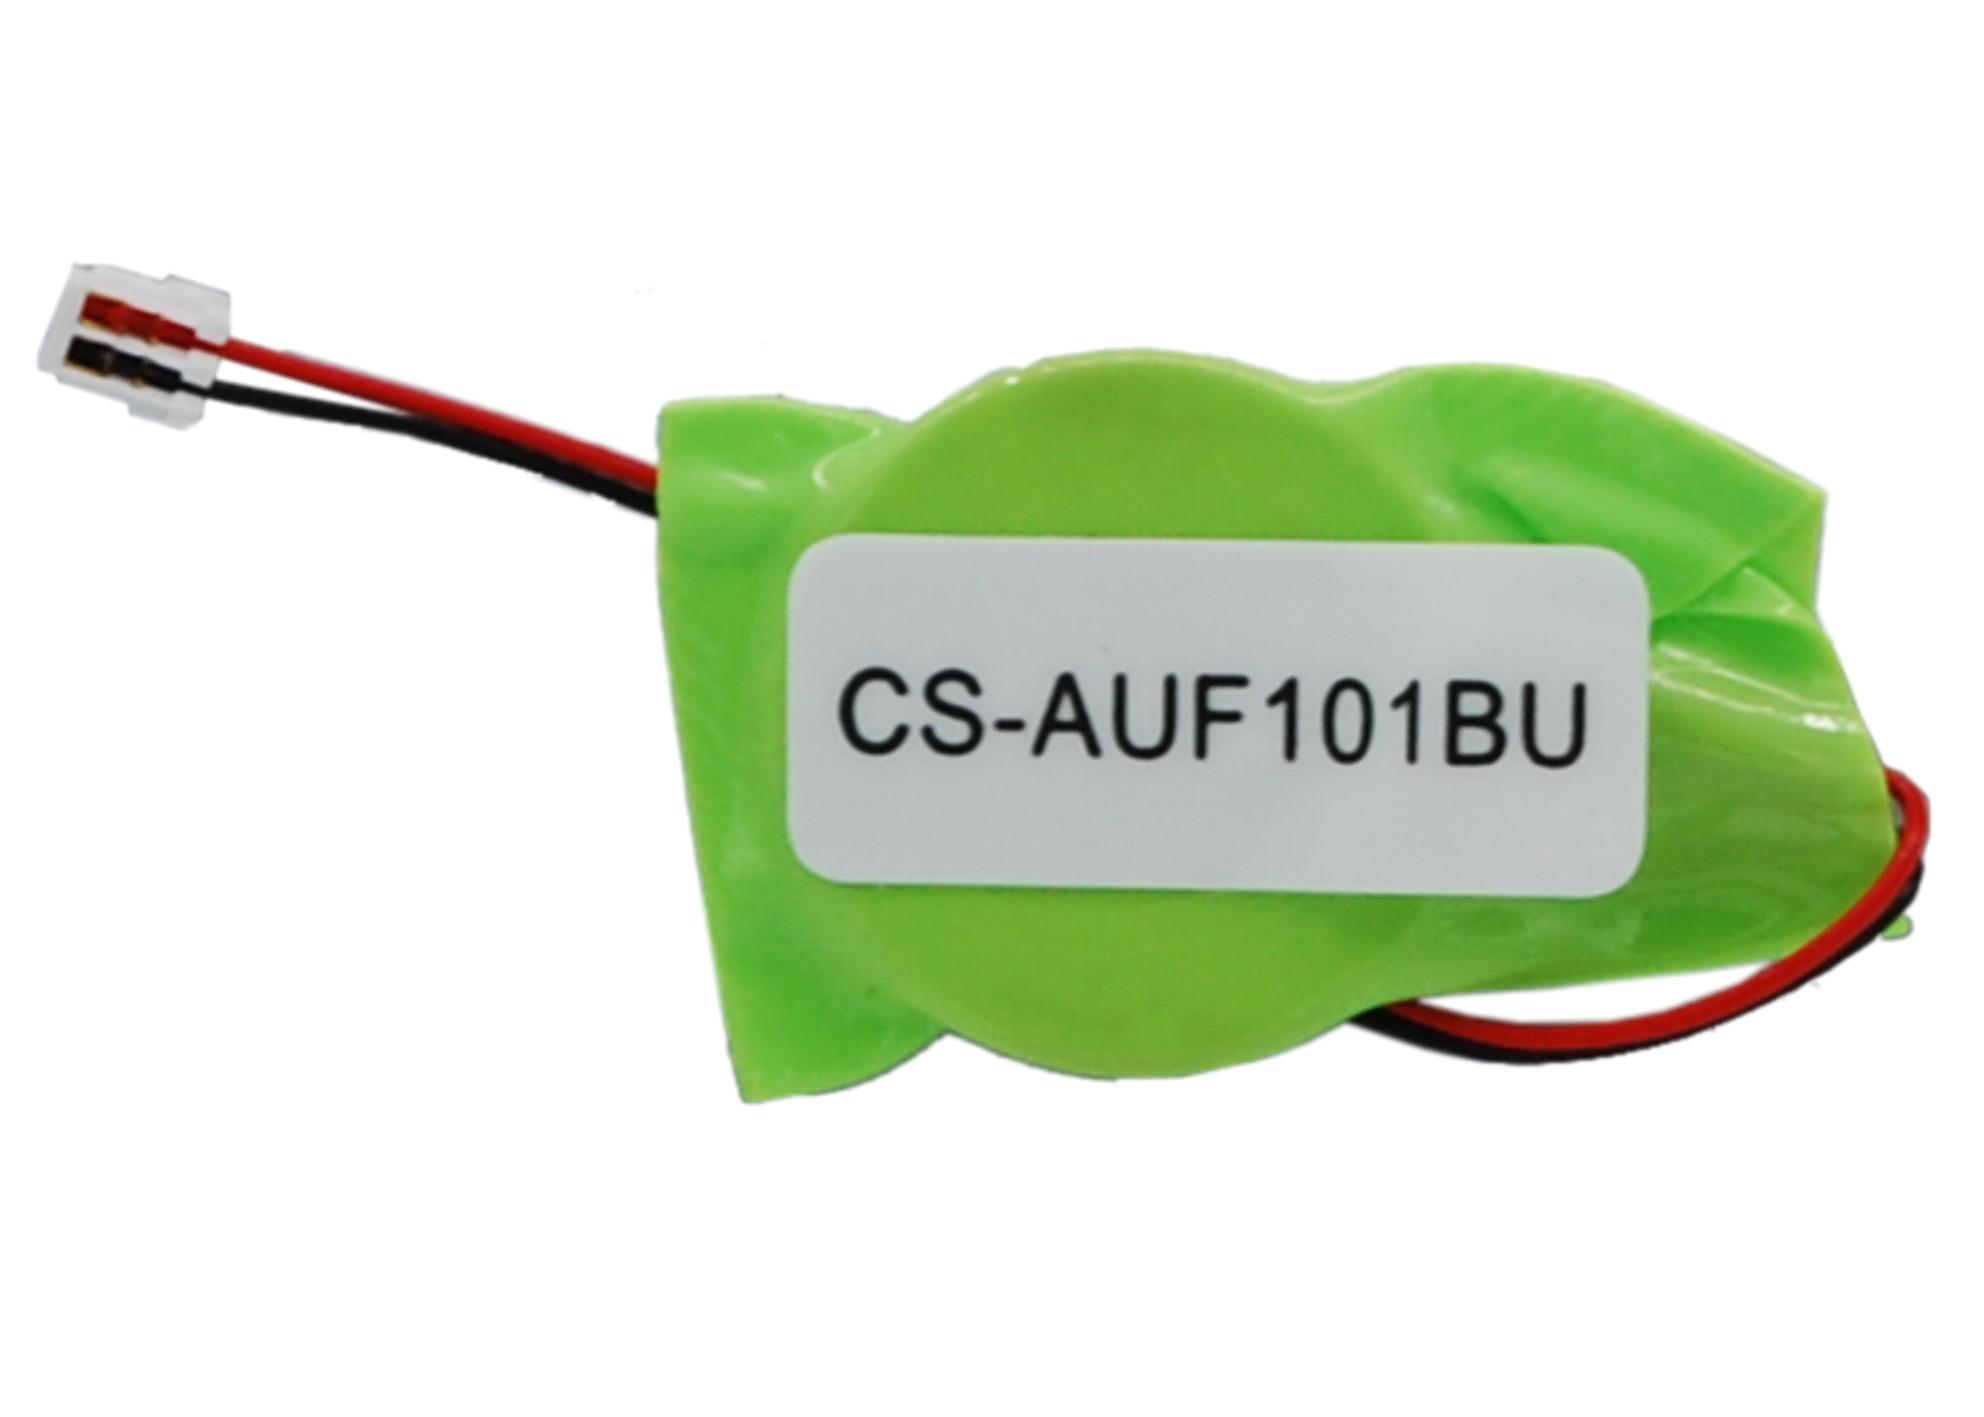 Cameron Sino baterie cmos pro ASUS Eee Pad Transformer TF101 TF101-X1 16GB 3V Li-ion 40mAh zelená - neoriginální